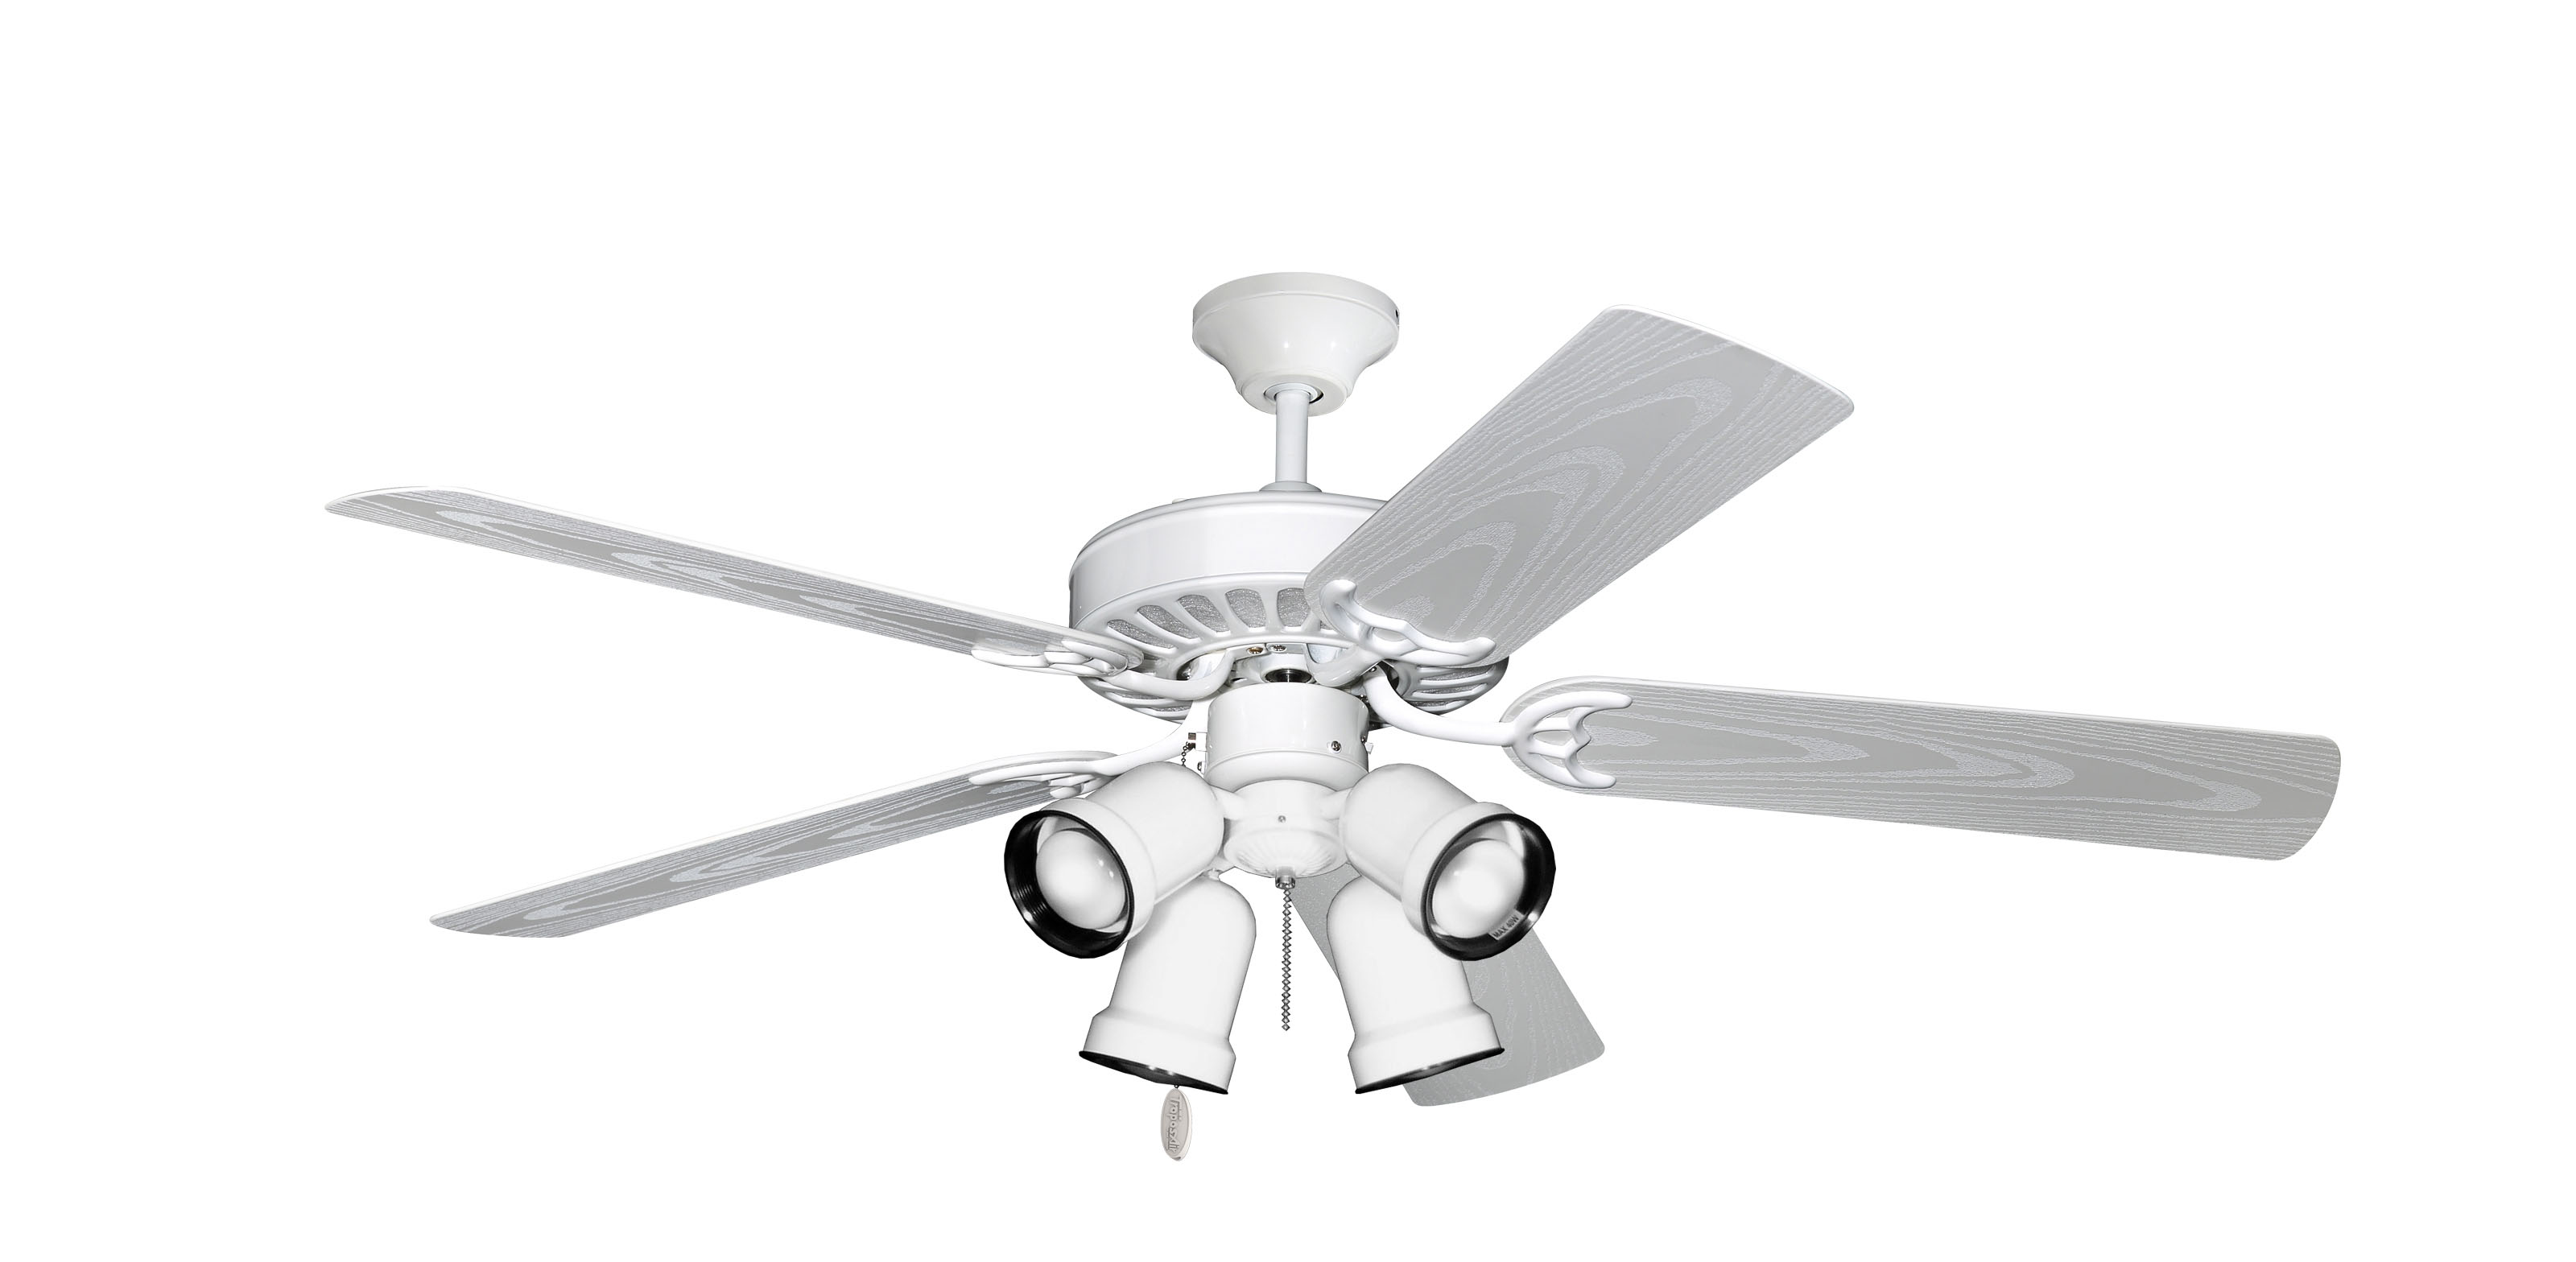 Stand Fan Clip Art : White ceiling fan clipart panda free images